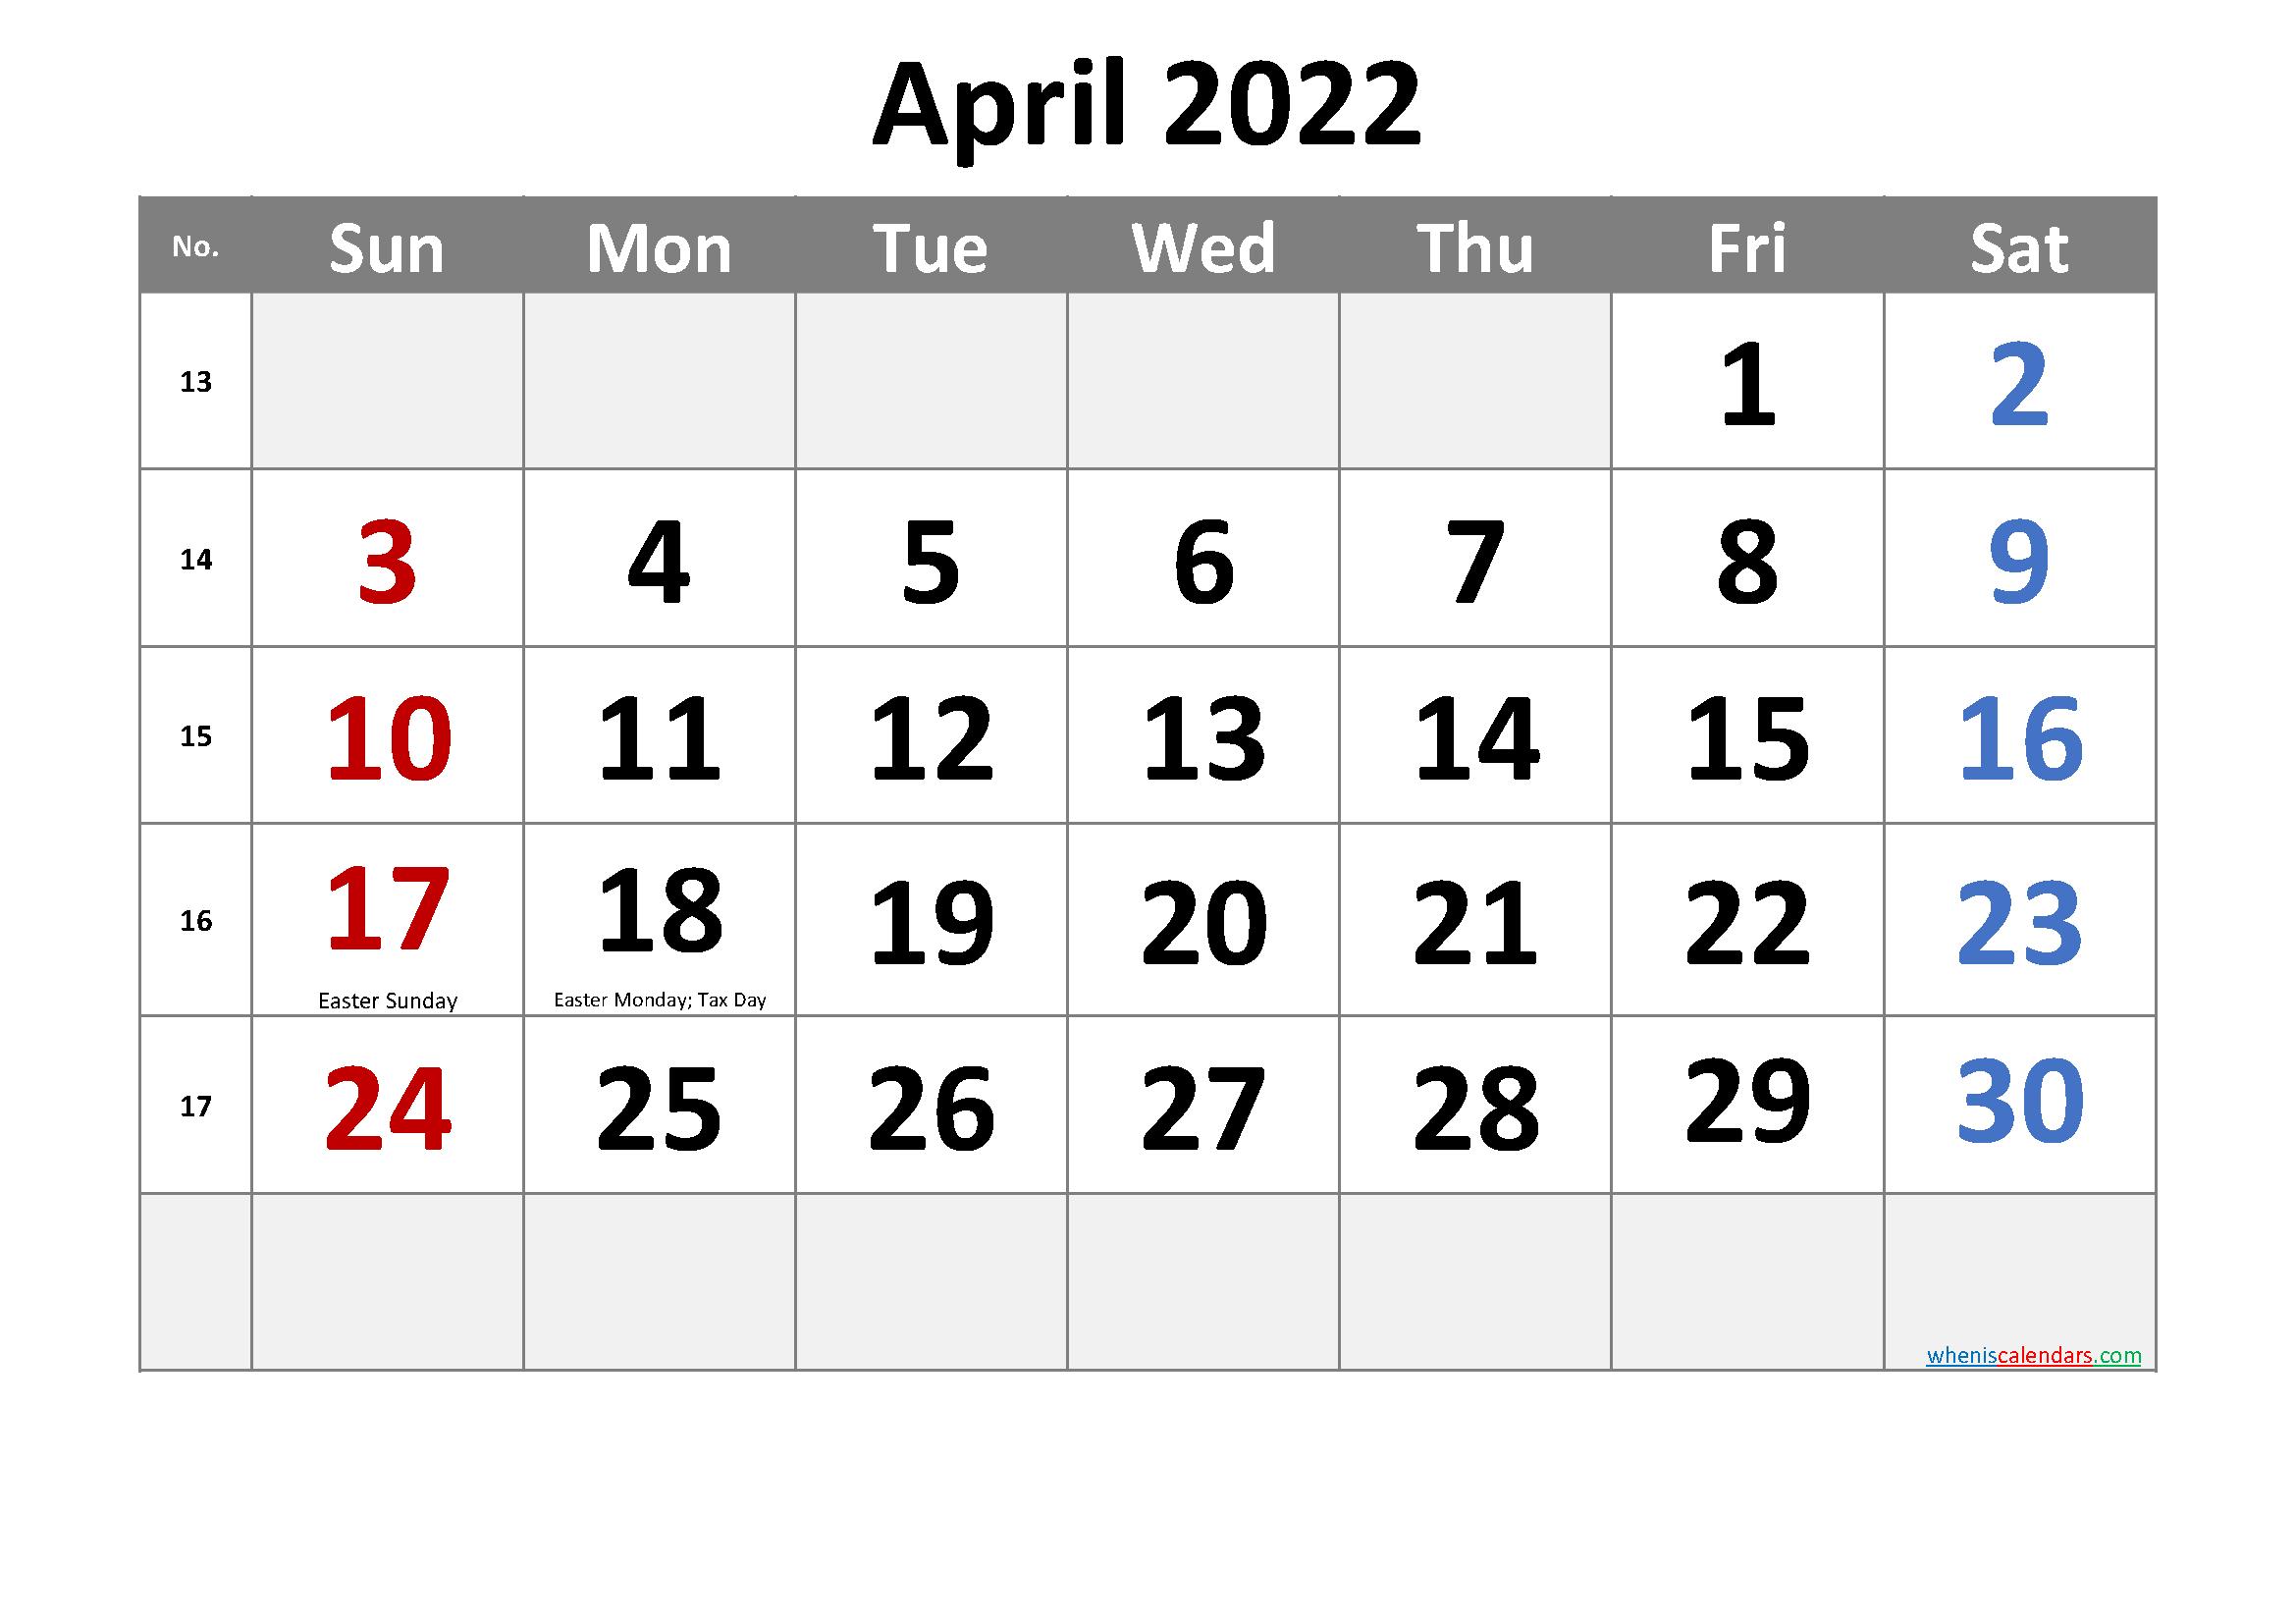 Free Printable April 2022 Calendar With Holidays With March April 2022 Calendar Free Printable